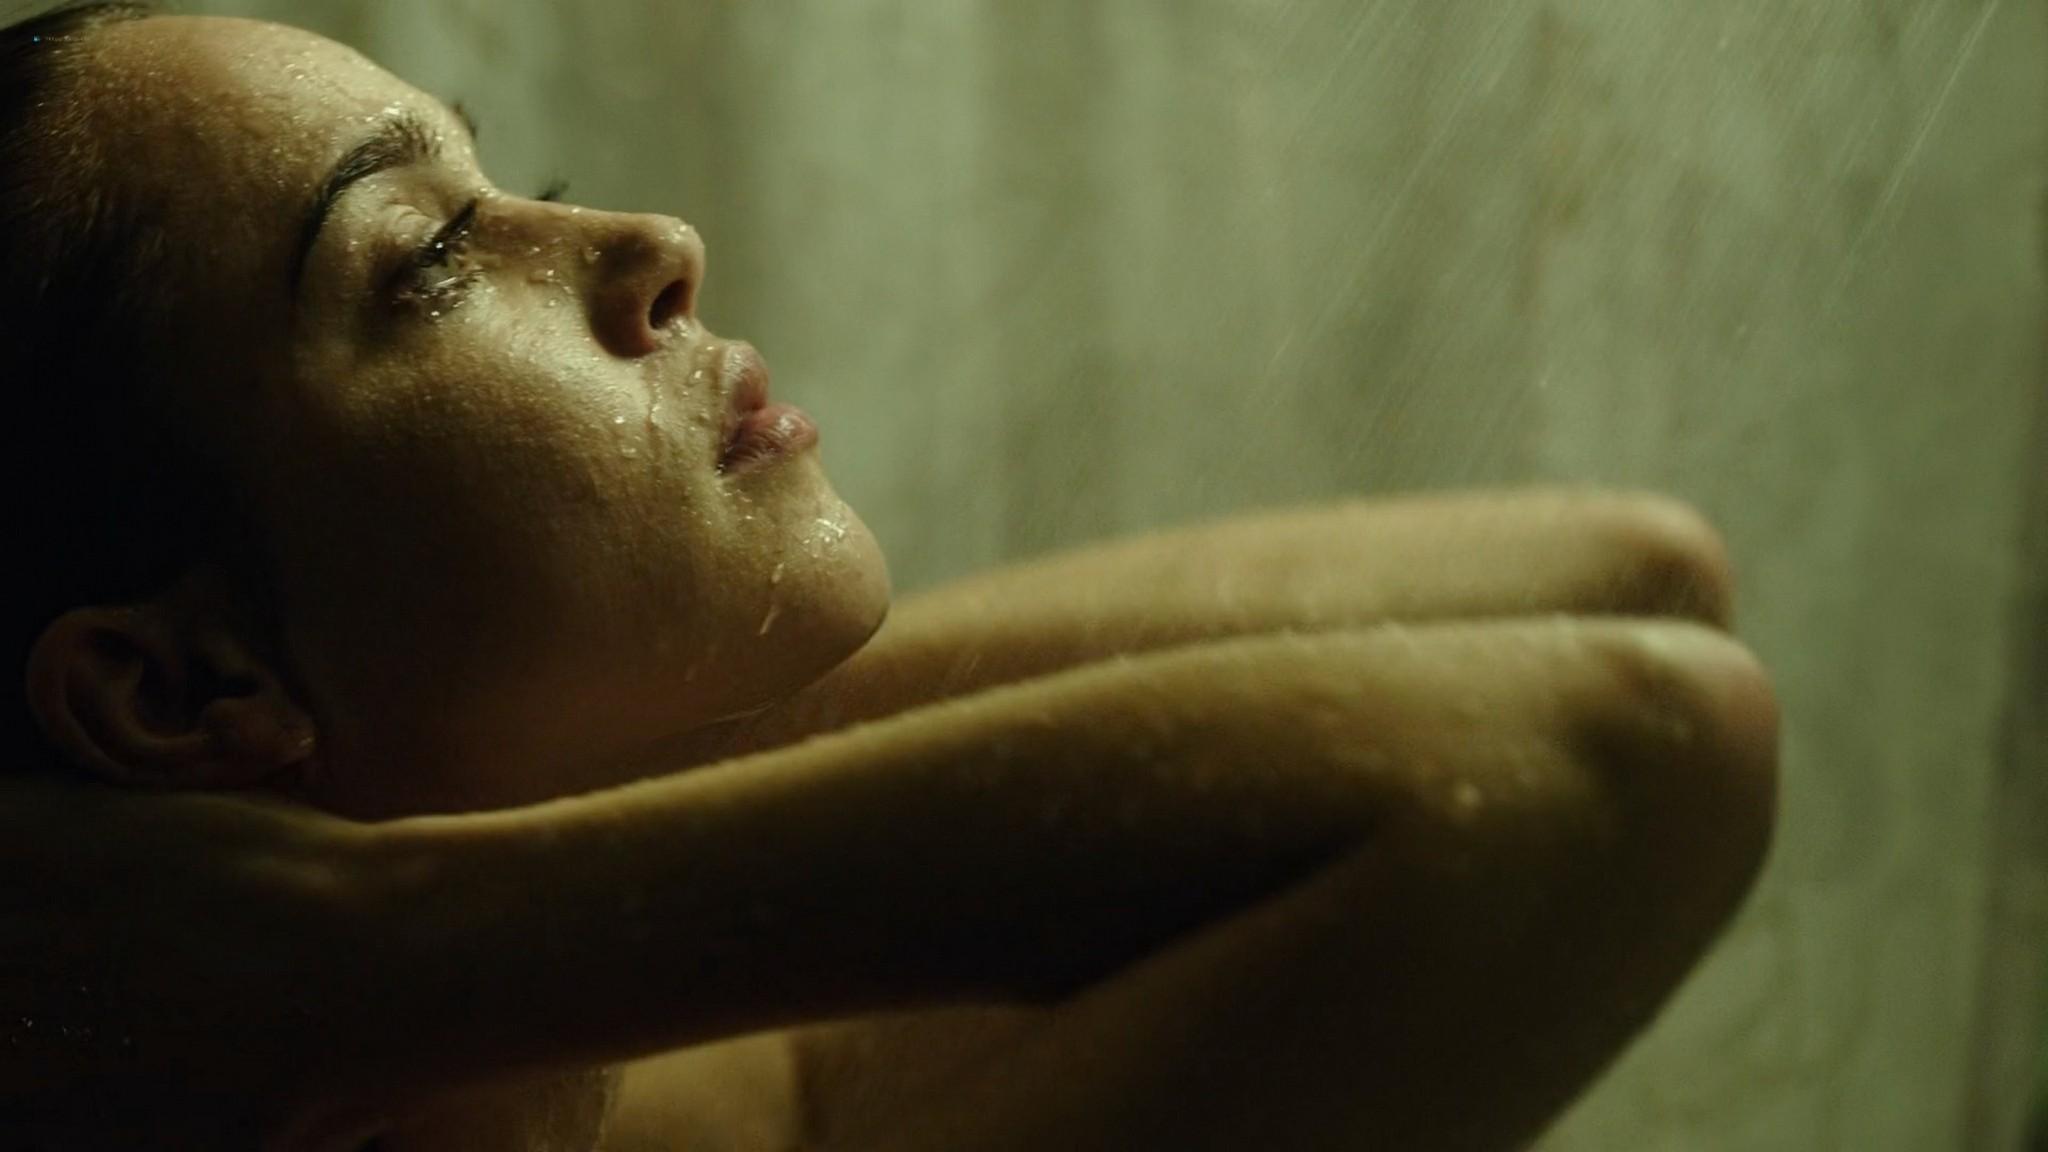 Matilda Anna Ingrid Lutz hot and sexy Rings 2017 1080p BluRay 11